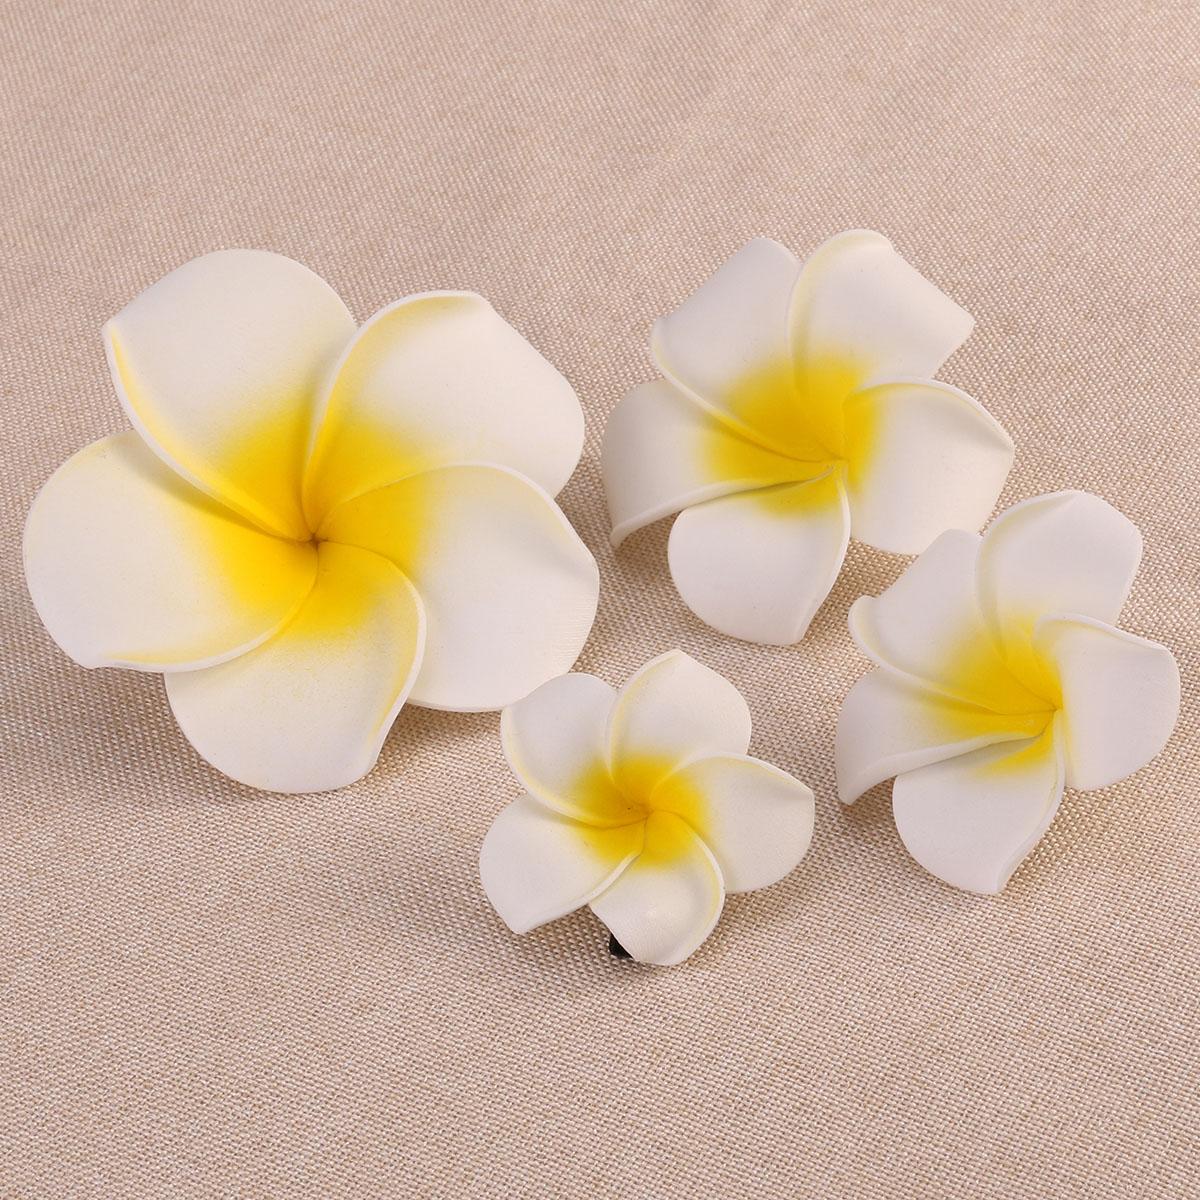 Nicexmas 4pcs Hawaiian Flowers Hair Clips Barrette Tropical Wedding